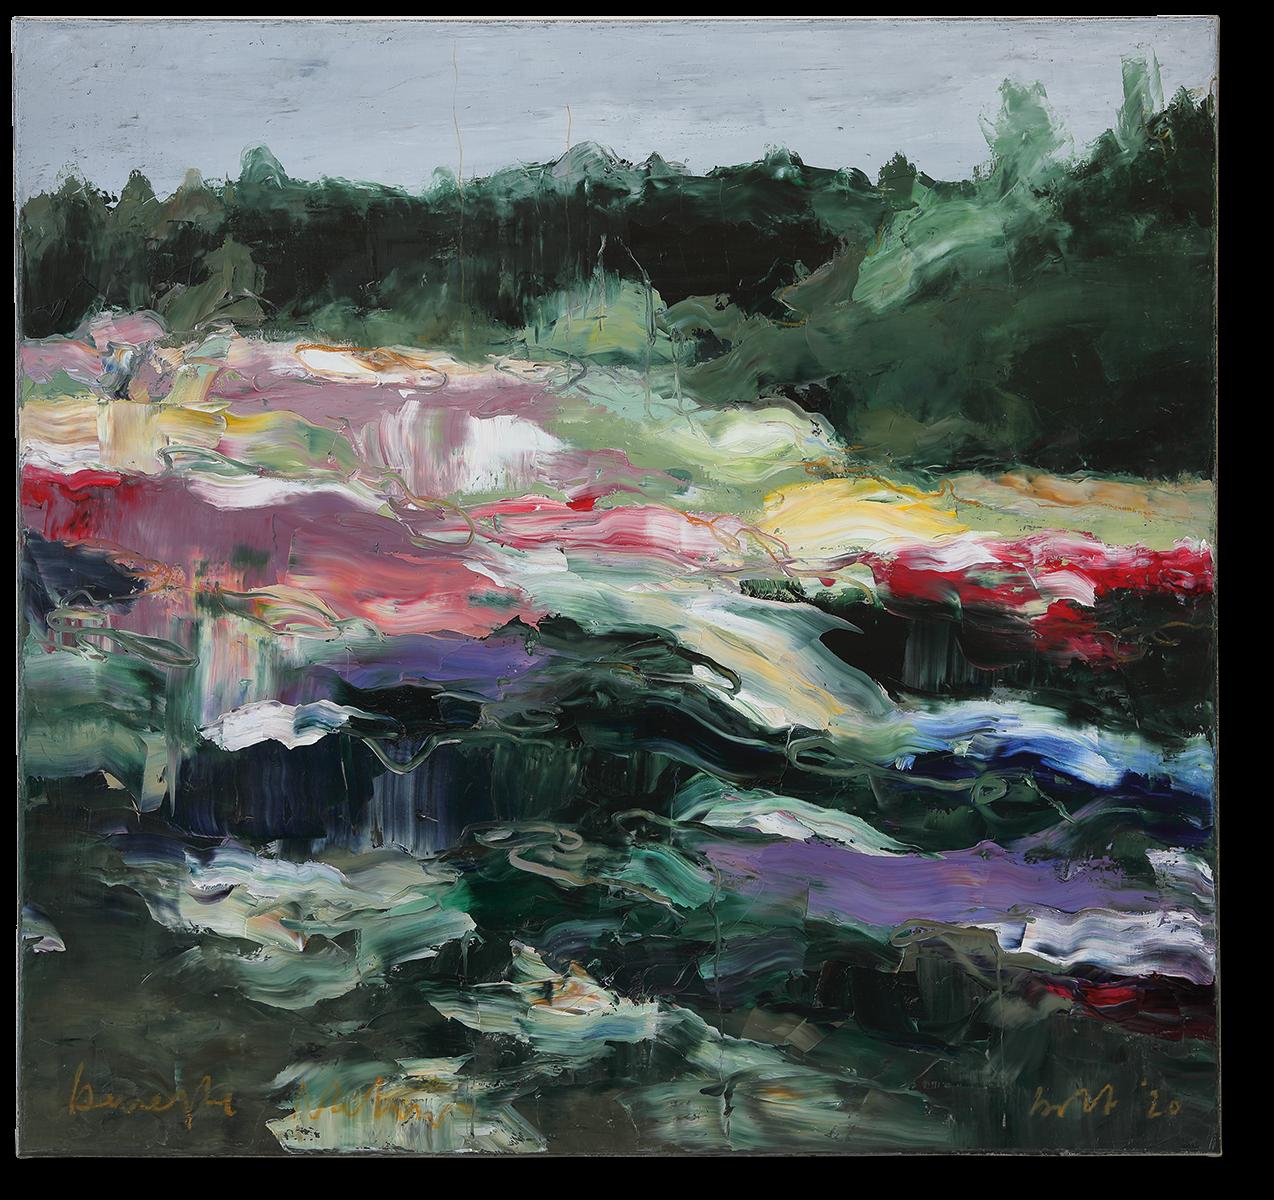 Bewegte Natur | 2020 | Öl auf Leinwand | 80 x 85cm